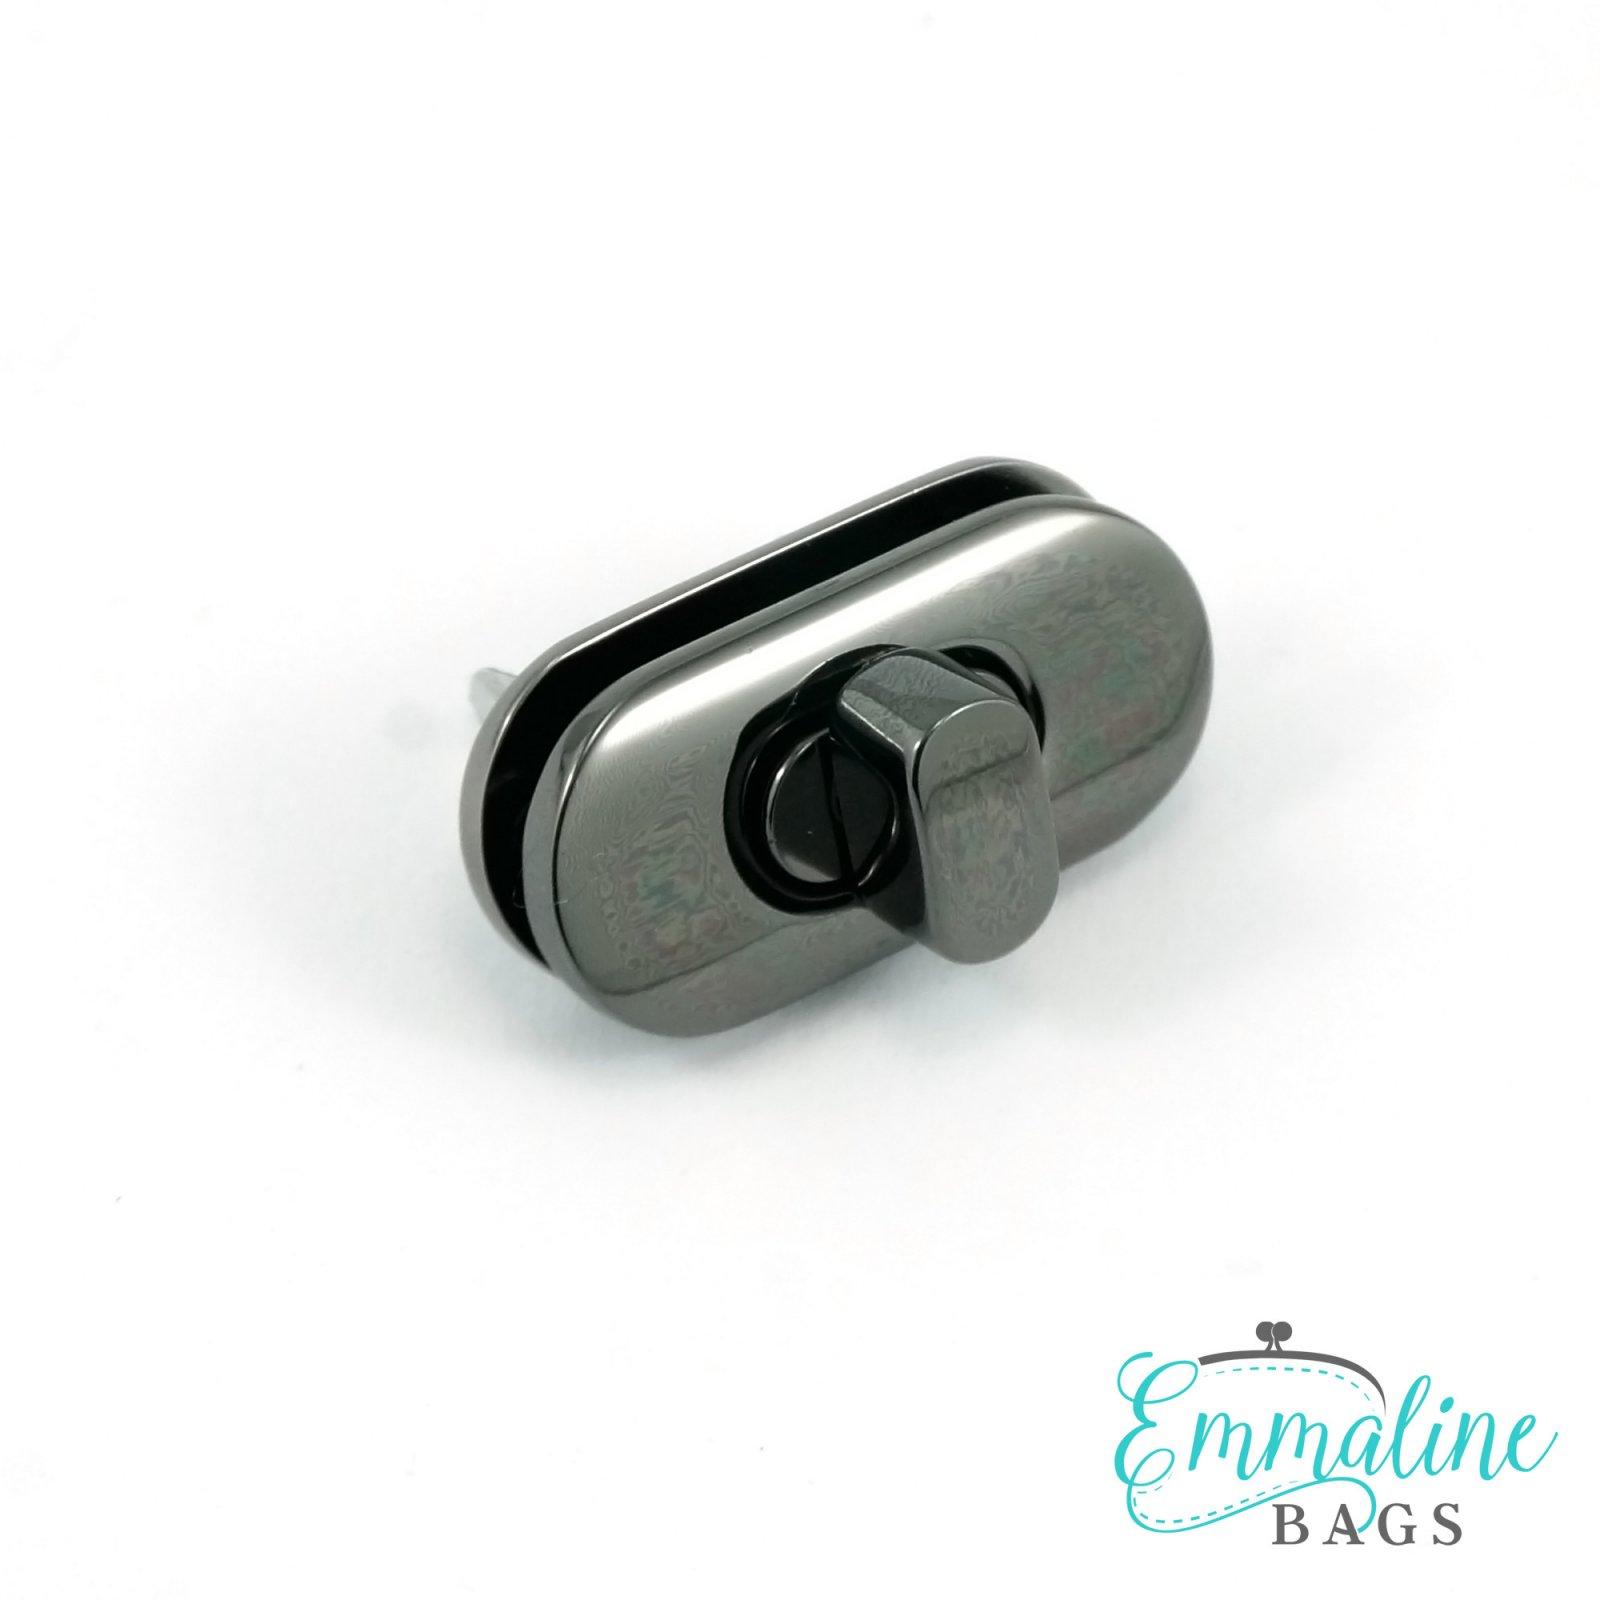 Emmaline Bags - Small Turn Lock in Gunmetal